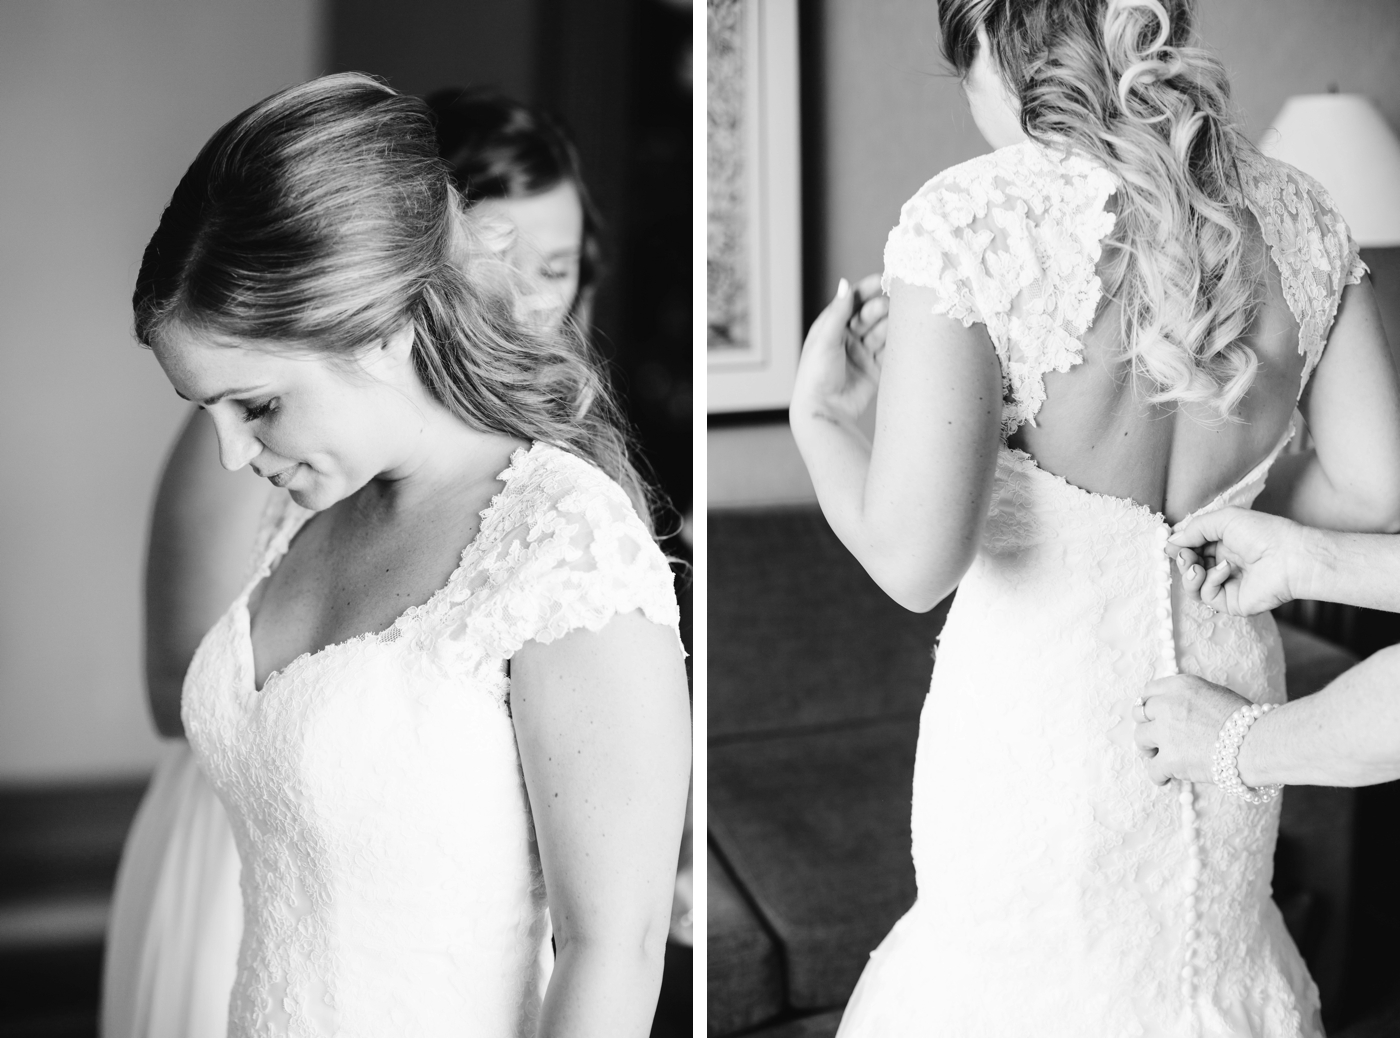 chicago-fine-art-wedding-photography-chiapetta3